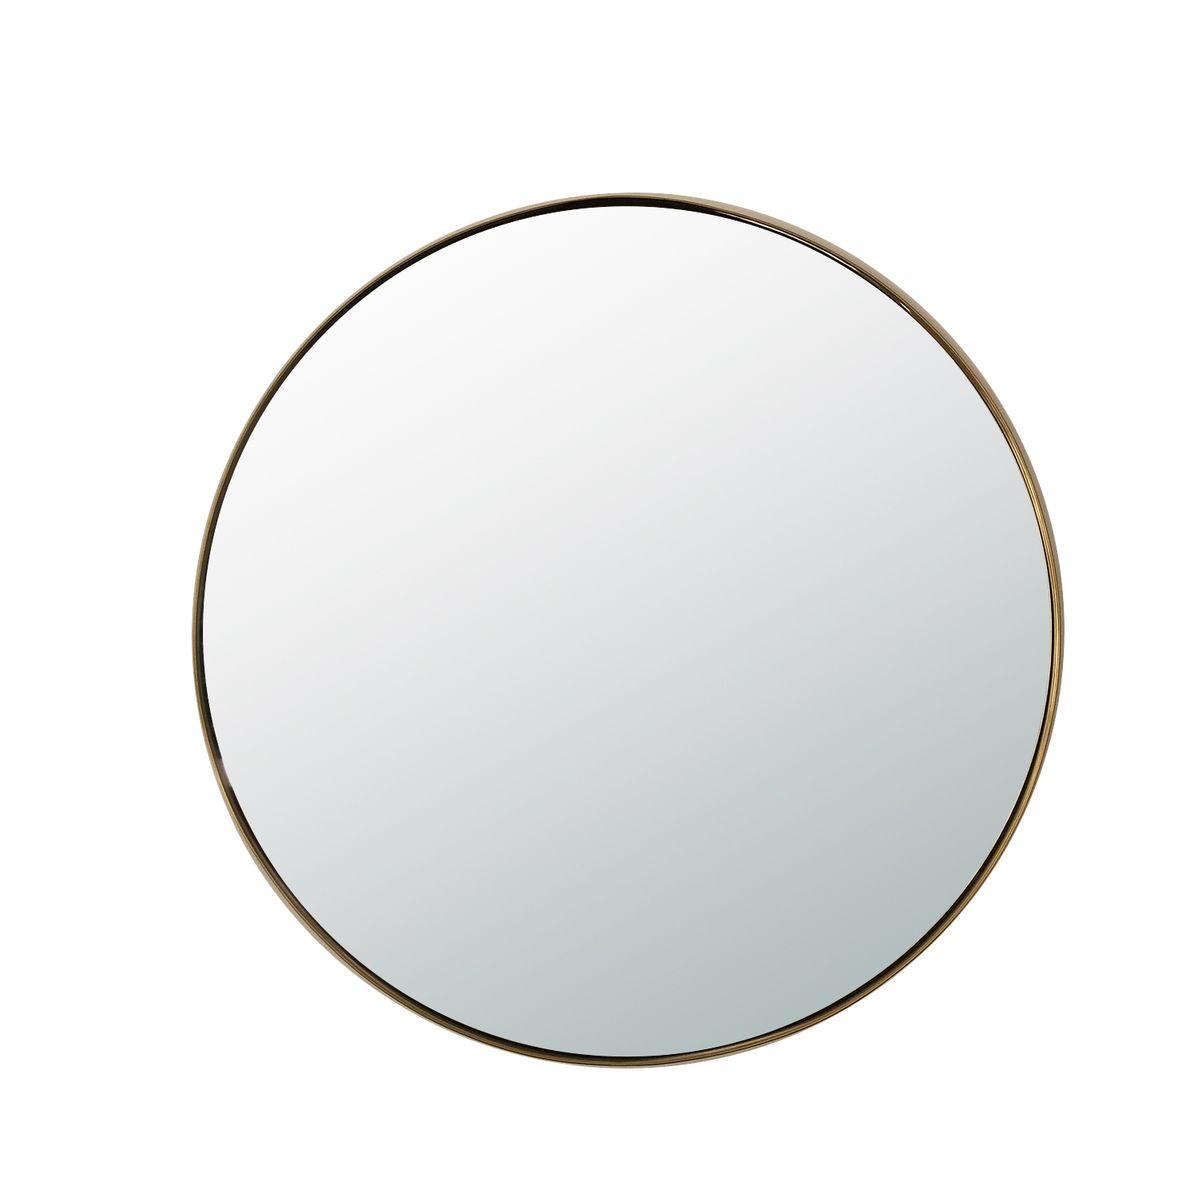 Miroir rond Ø80 en laiton or